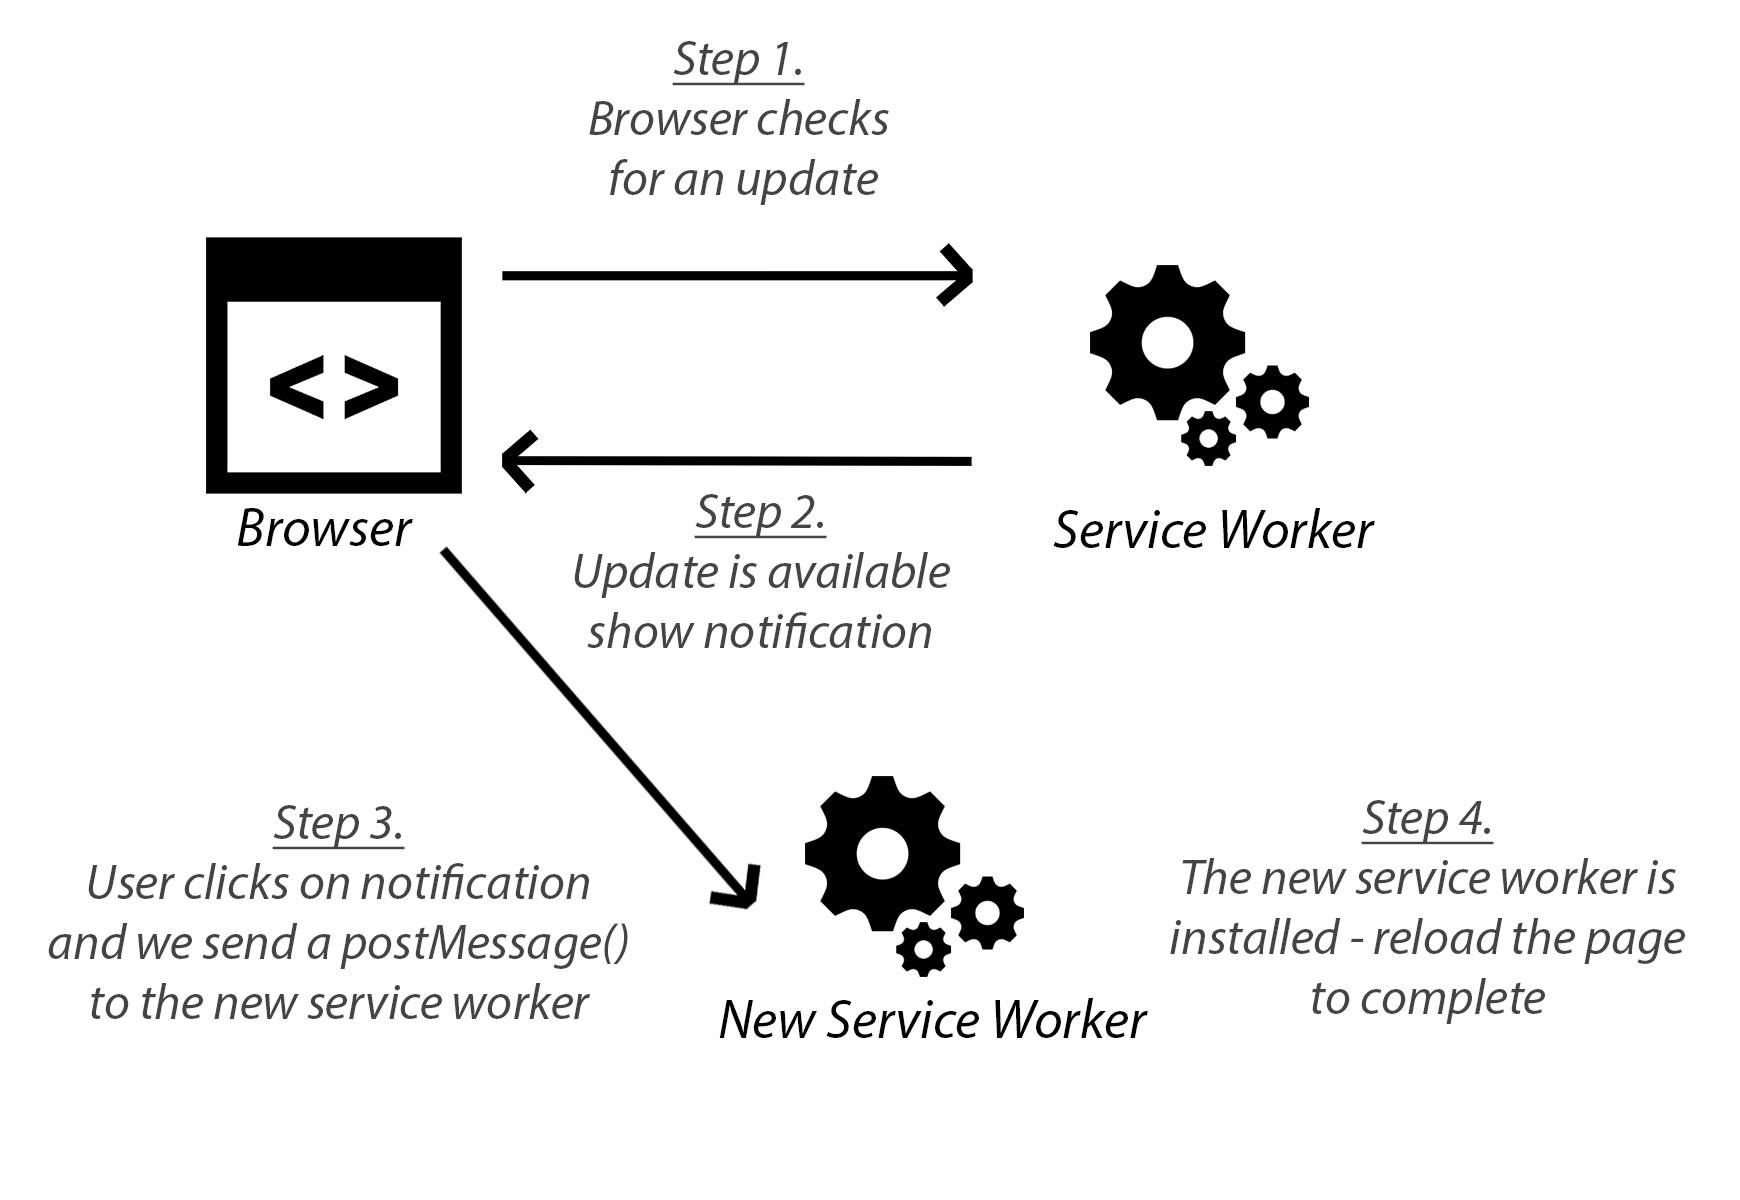 New version available diagram - Progressive Web App